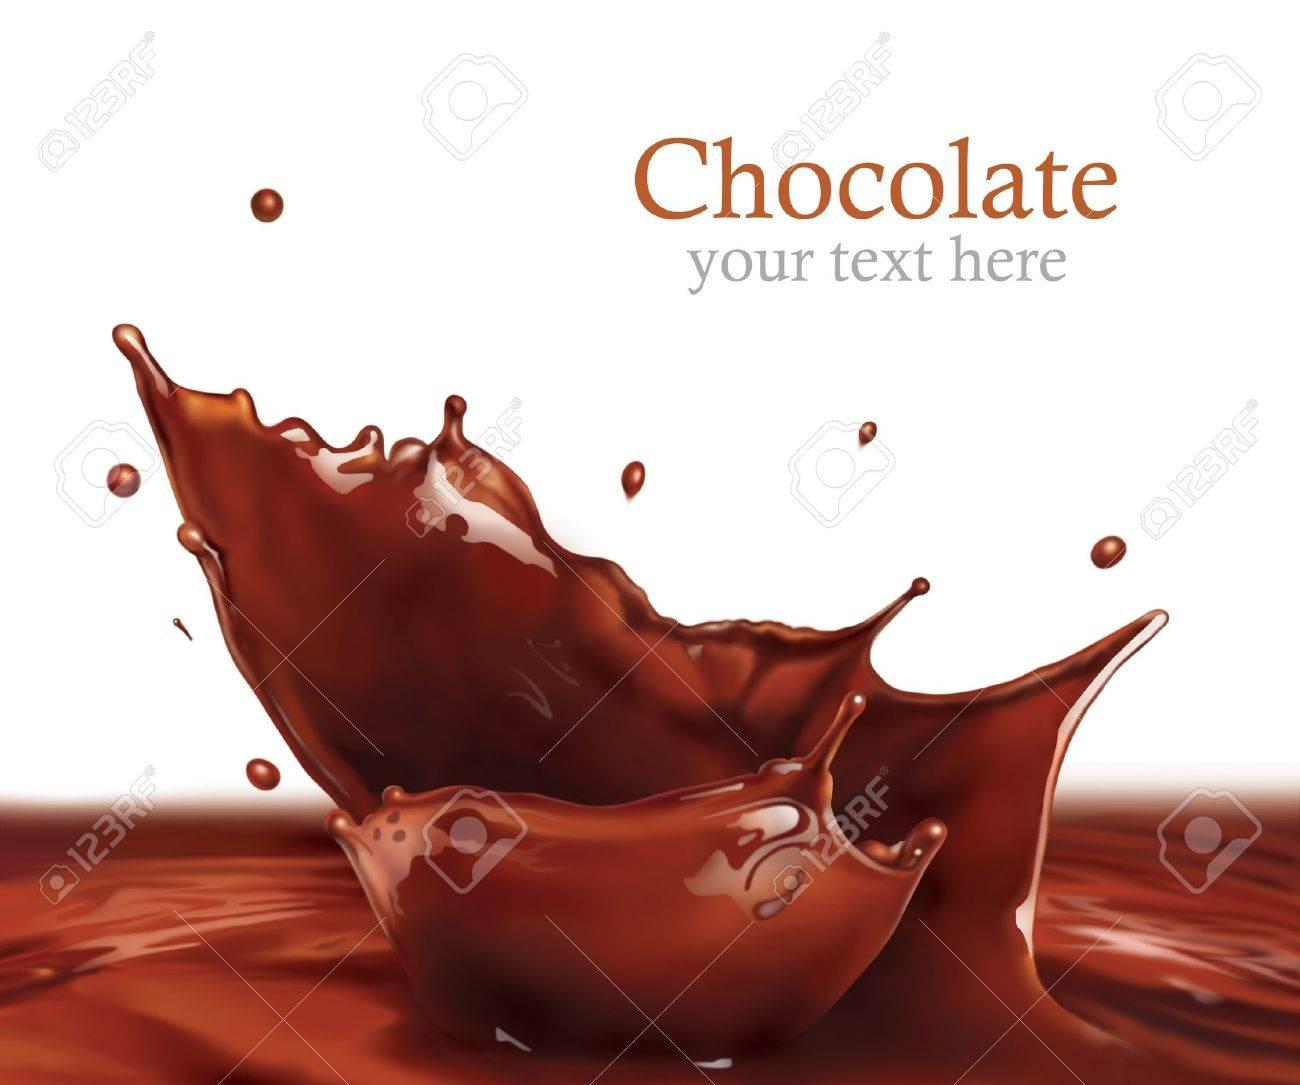 Fresh Liquid Chocolate splash making amazing Waves and Drops, Digital Painting Stock Photo - 15013513